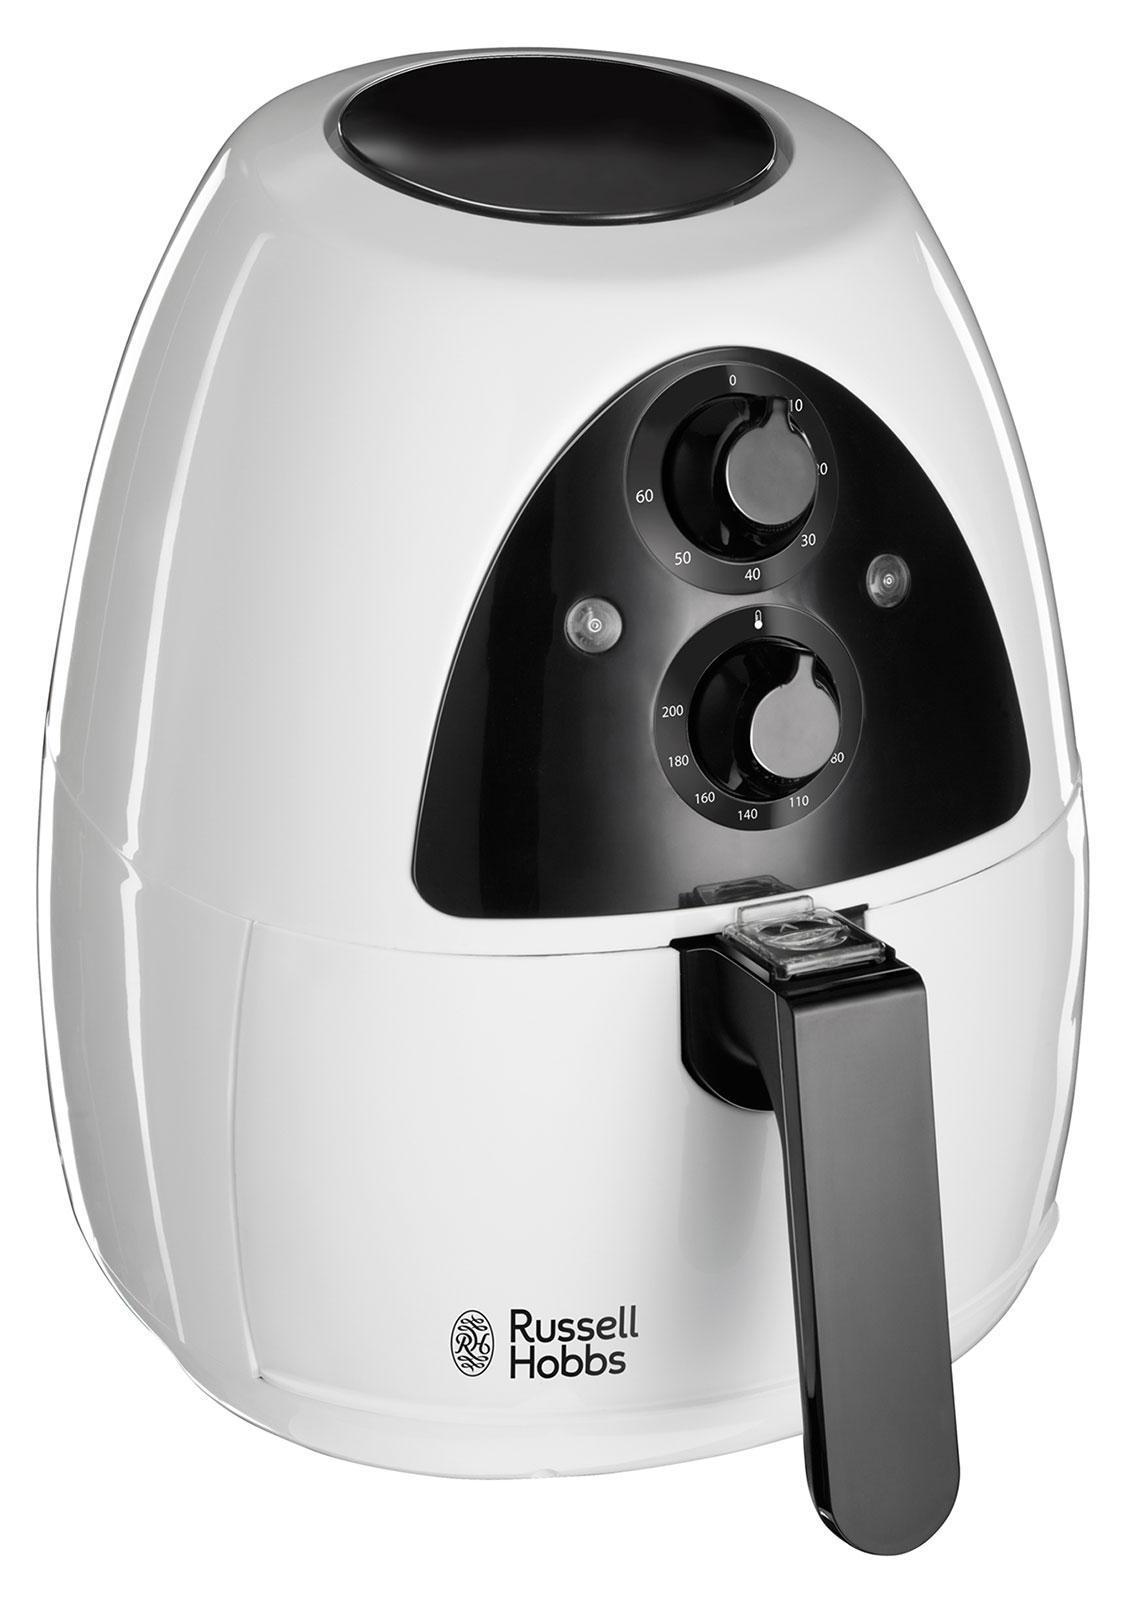 Russell Hobbs 20810-56 мультипечь